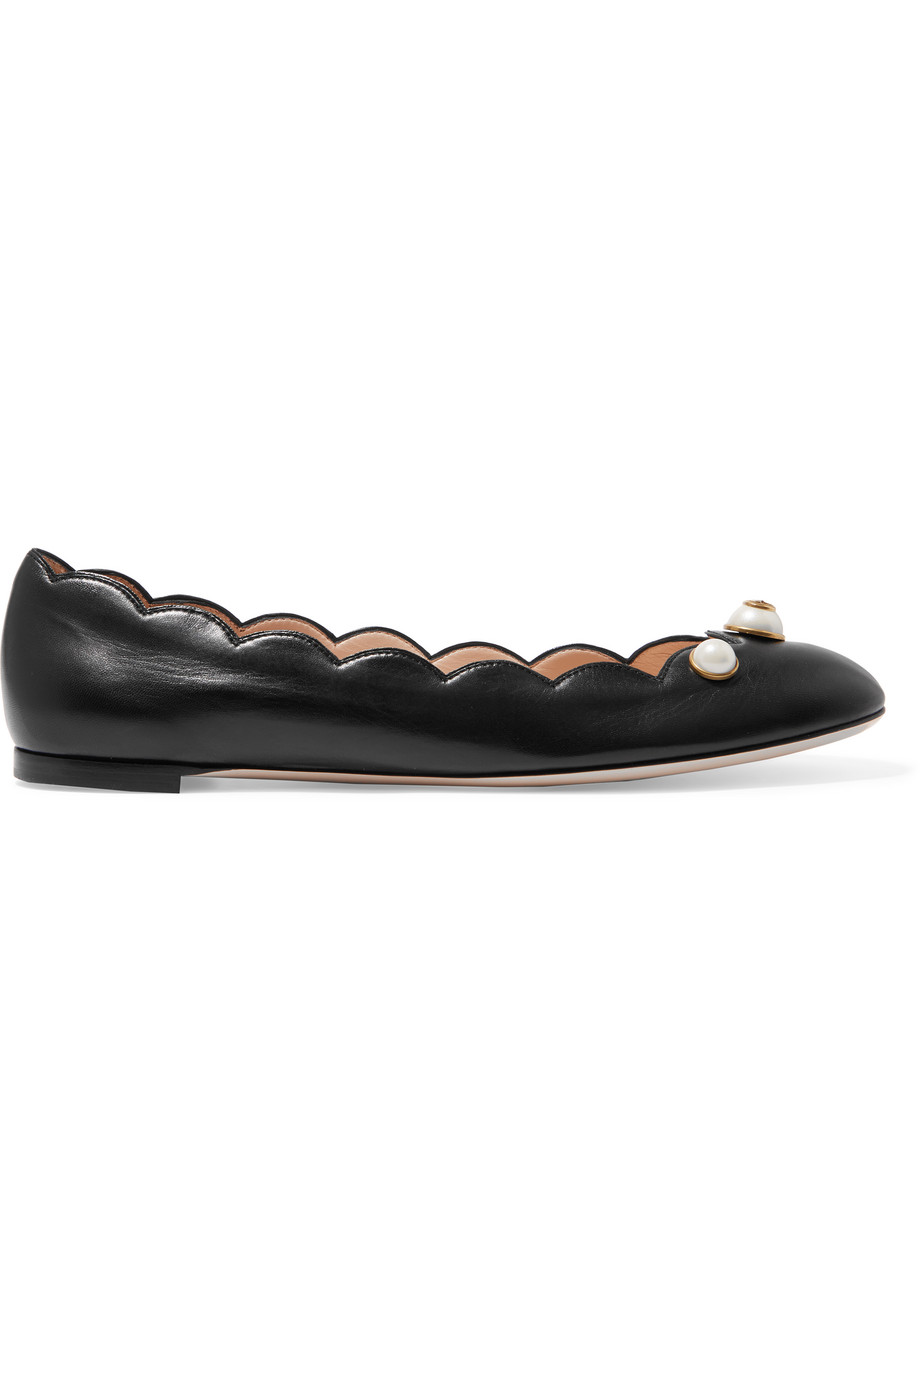 Gucci Embellished Leather Ballet Flats, Black, Women's US Size: 11, Size: 41.5